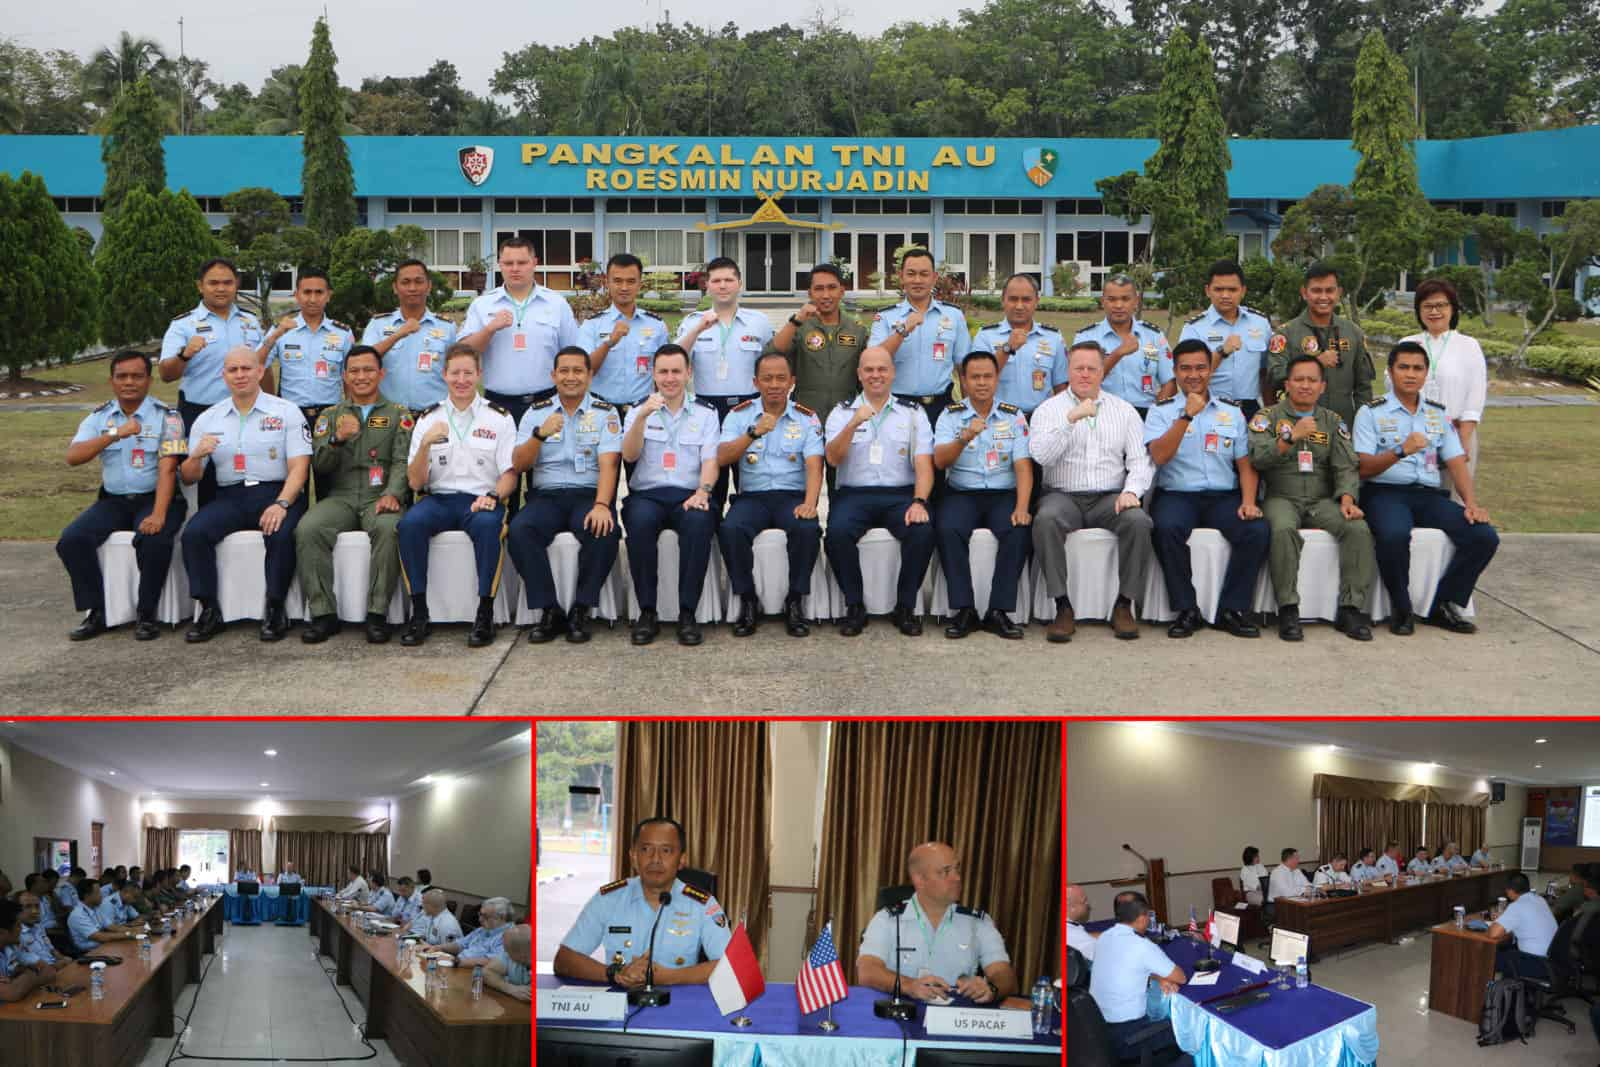 Danwing 6, Perkuat Persahabatan dan Kerjasama antara TNI AU dan U.S. PACAF